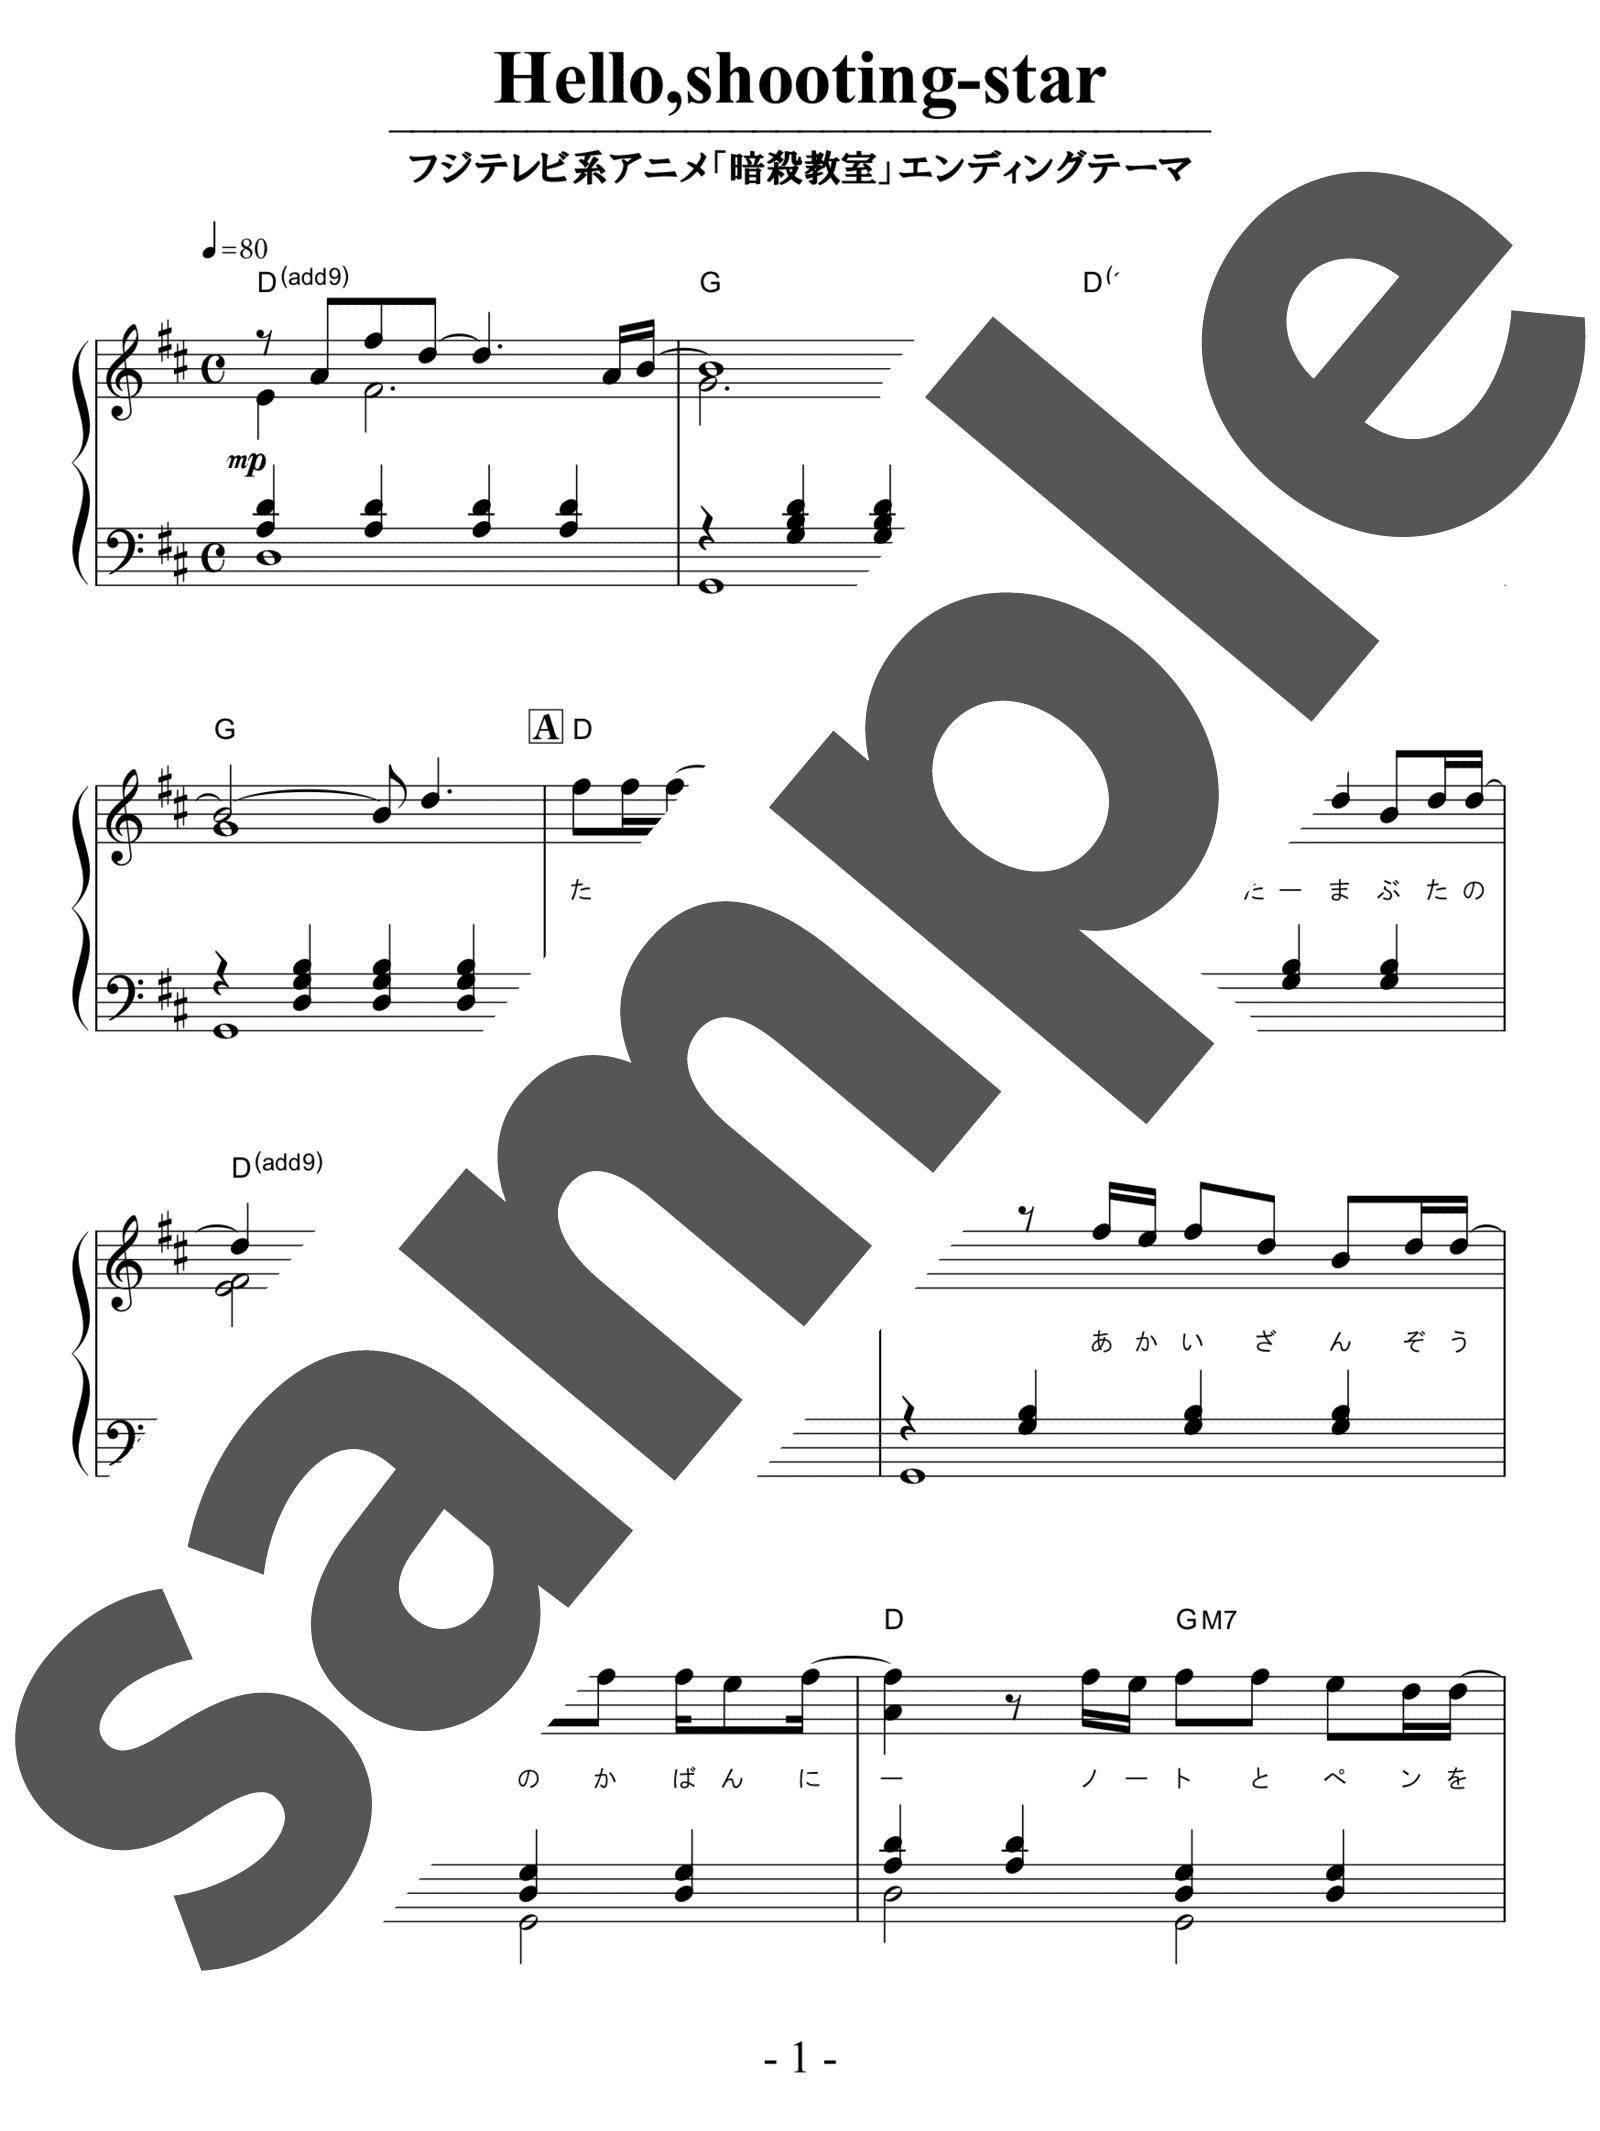 「Hello, shooting-star」のサンプル楽譜